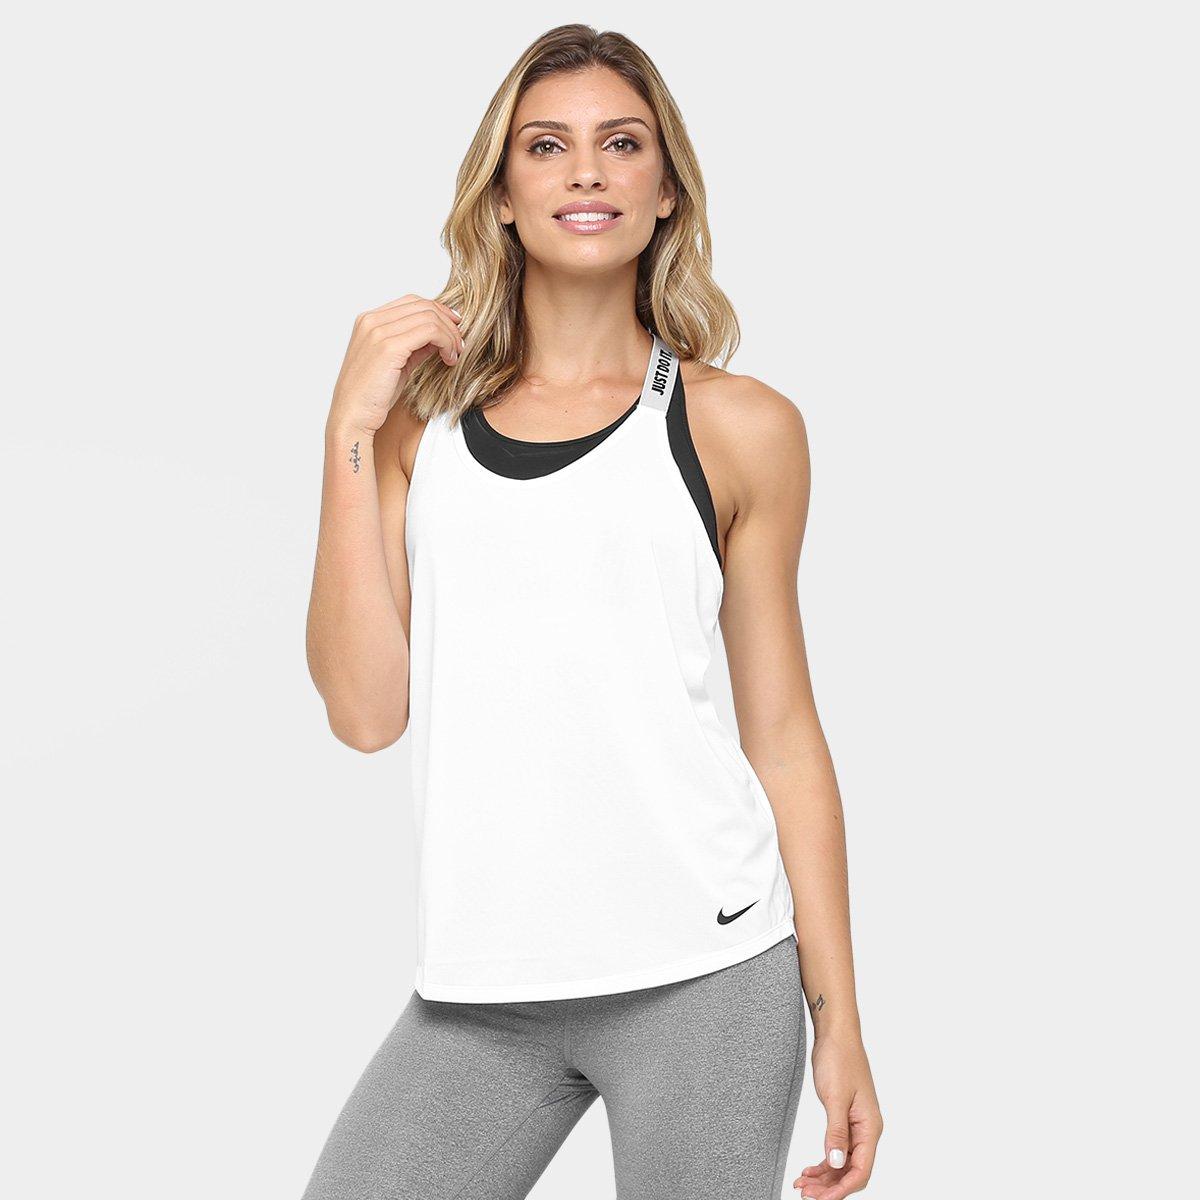 b575804f38289 Regata Nike Dry Elastika Feminina - Compre Agora